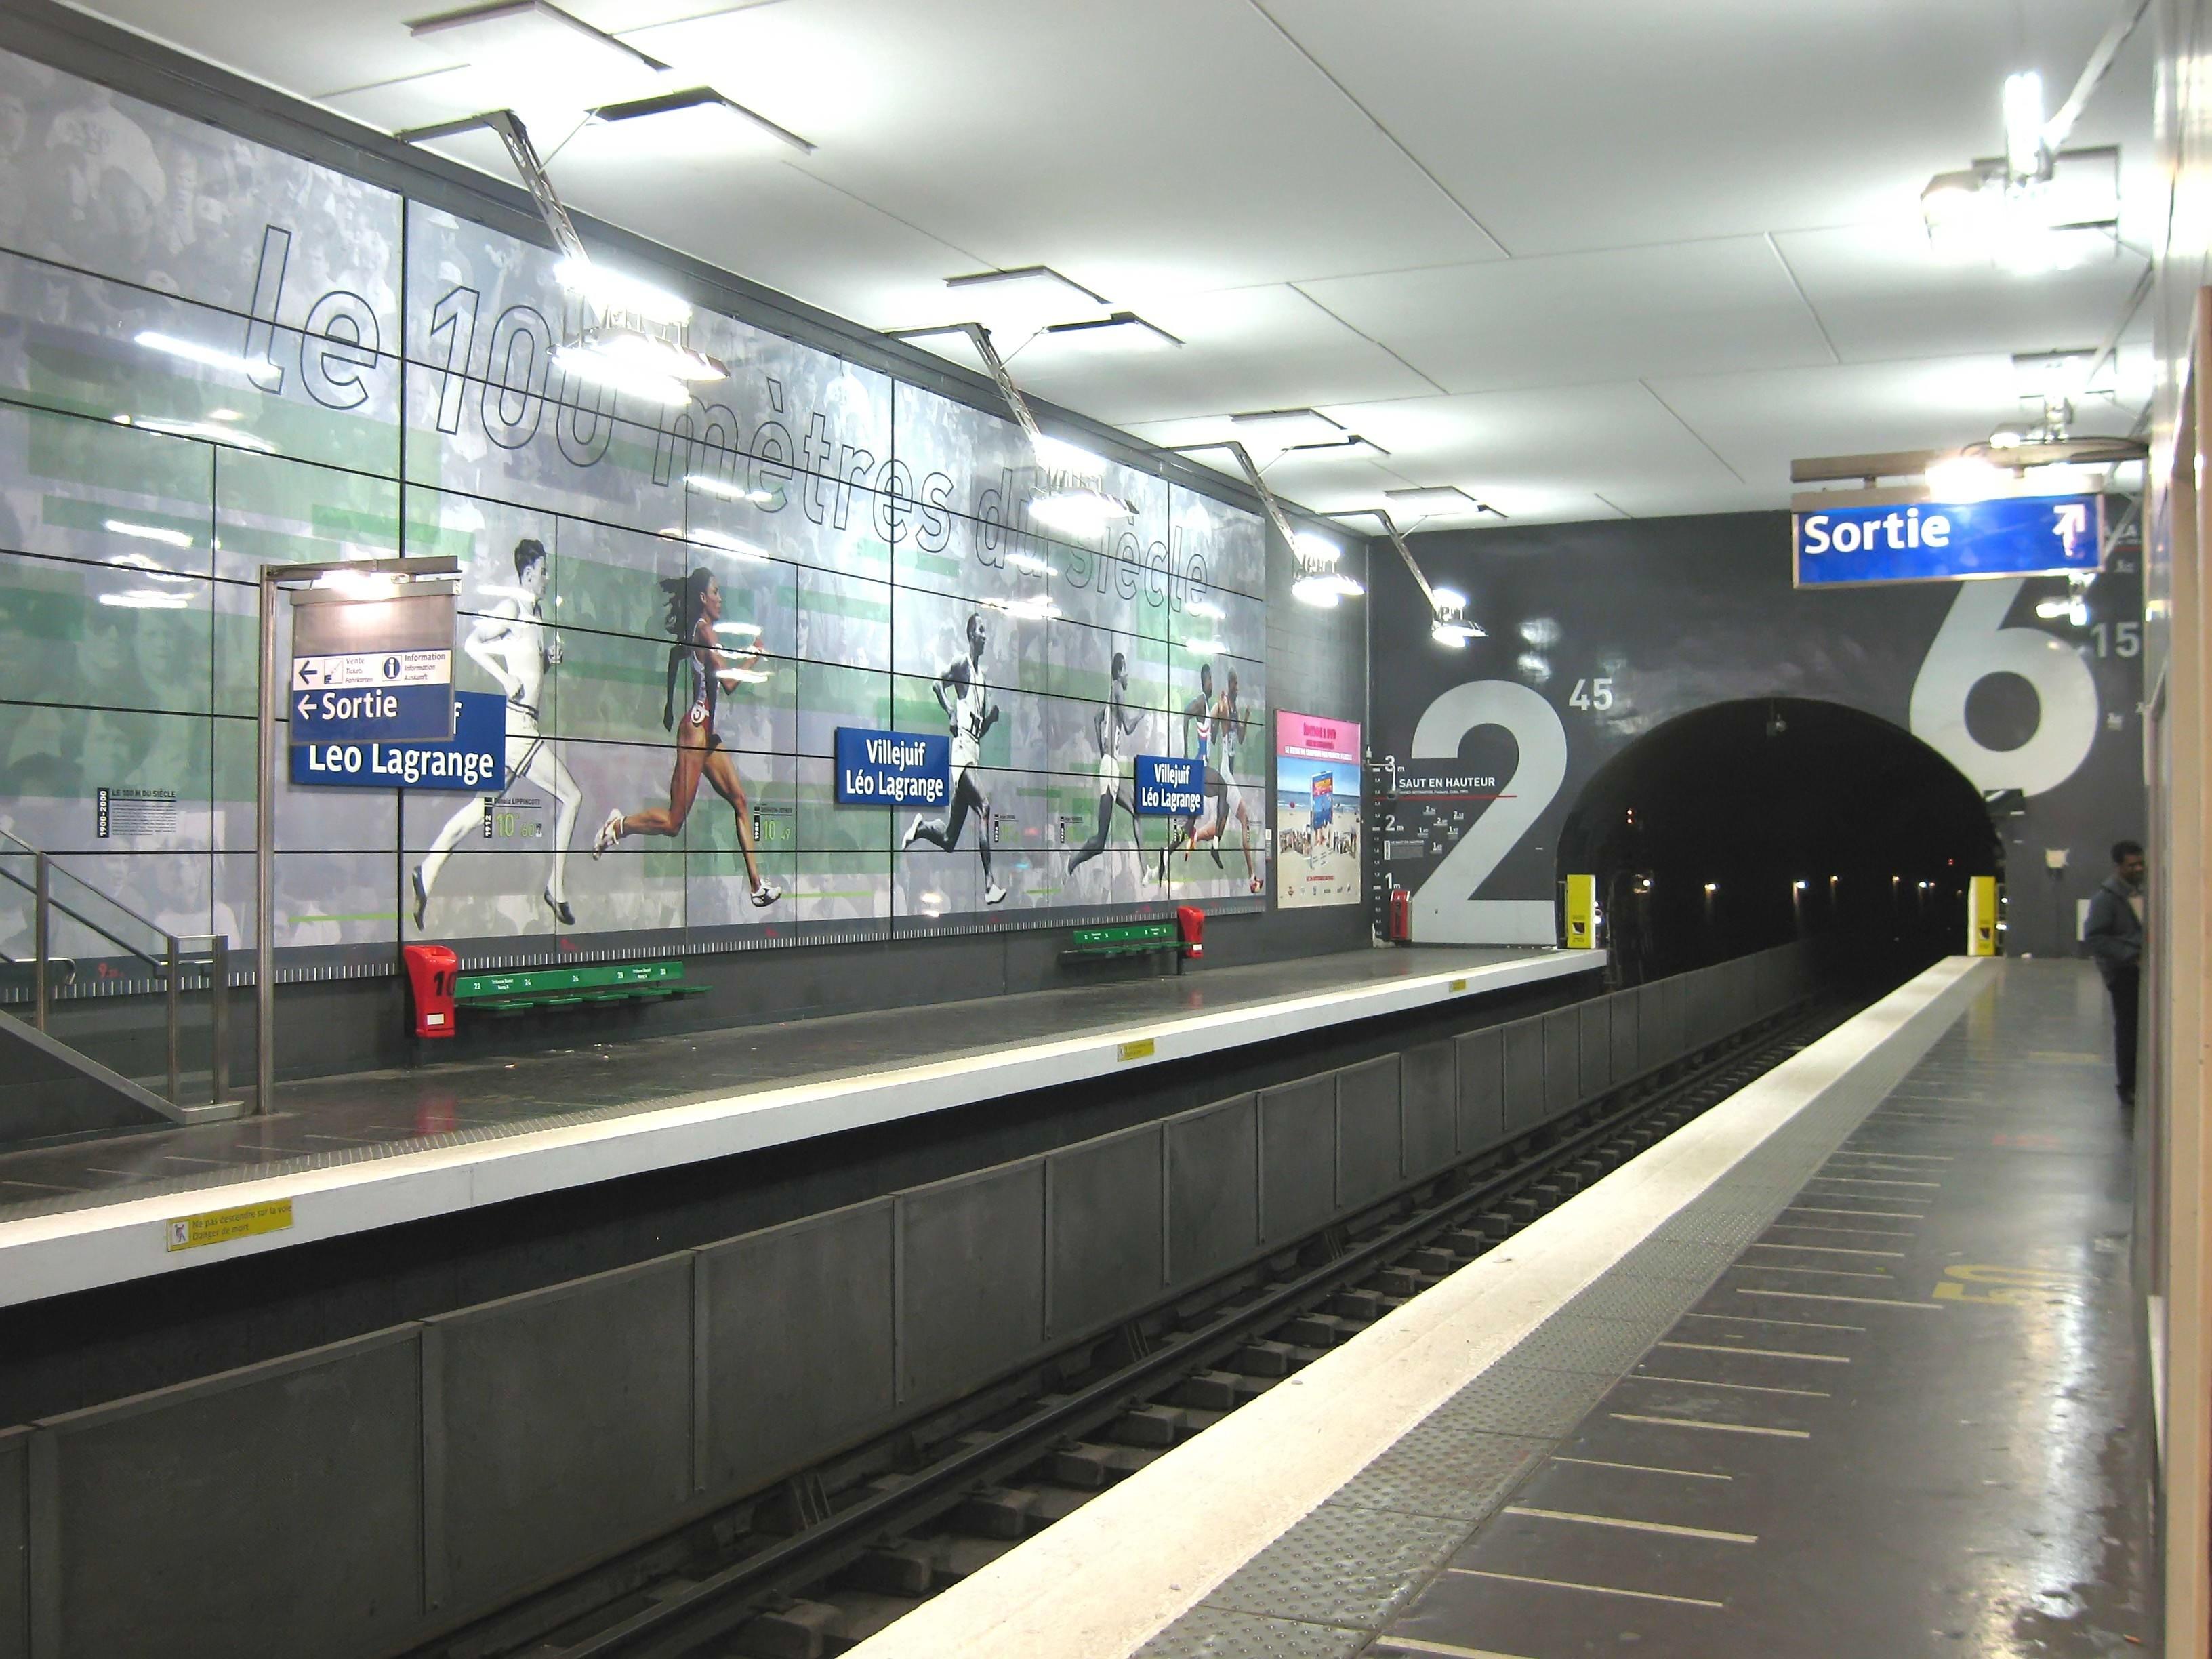 Métro Villejuif Léo Lagrange ligne 7